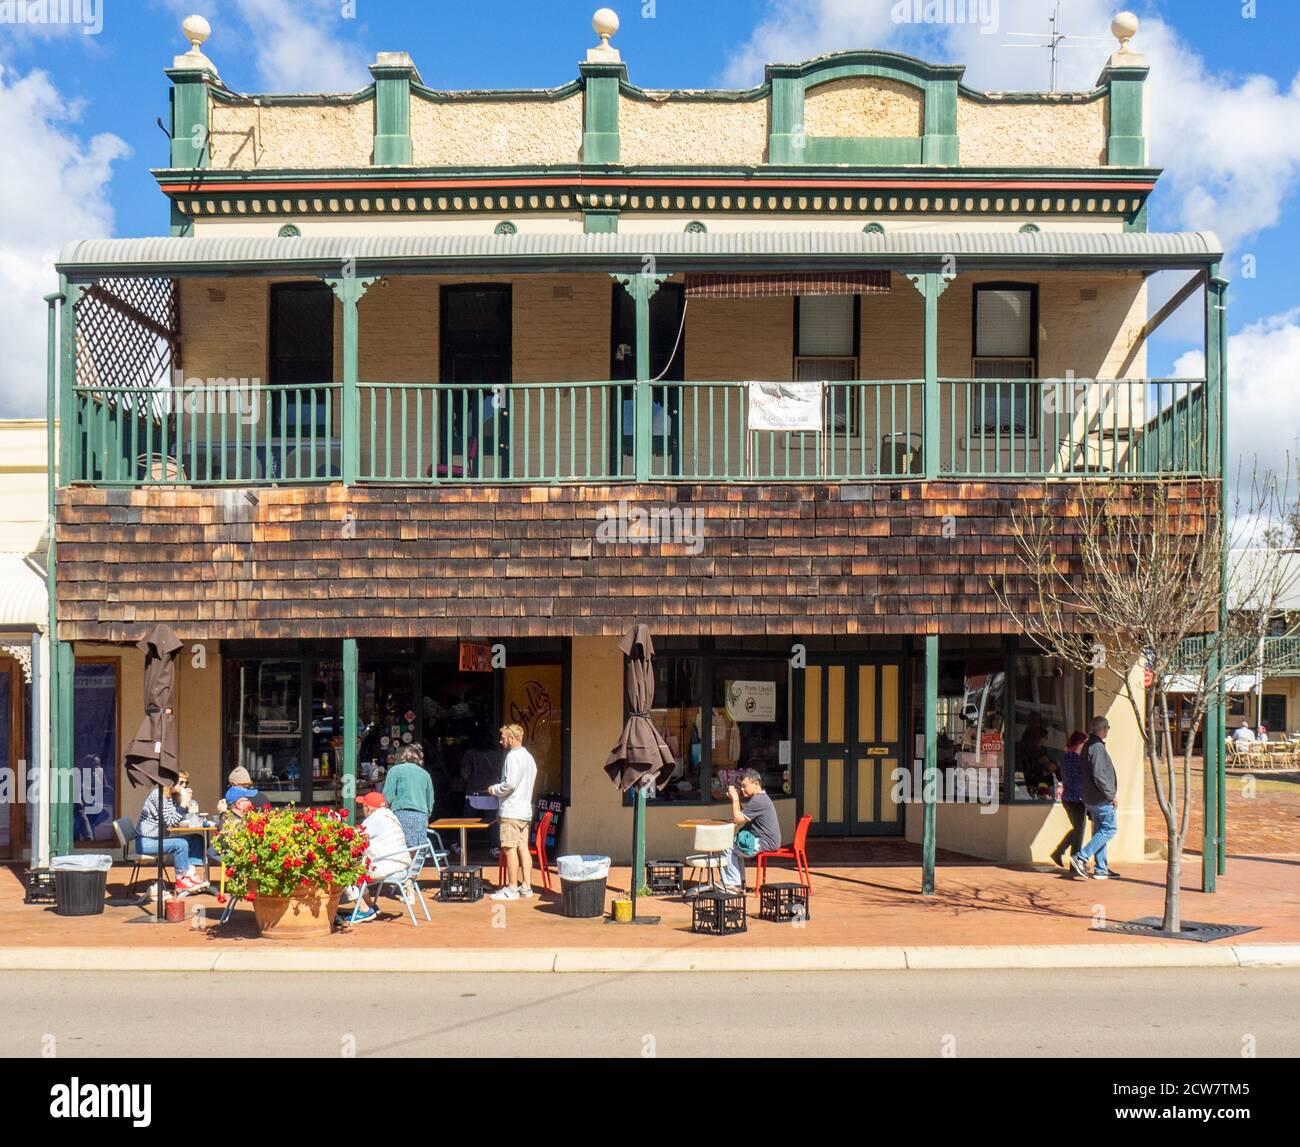 Jules Shoppe popular cafe restaurant on Avon Terrace York Western Australia. Stock Photo